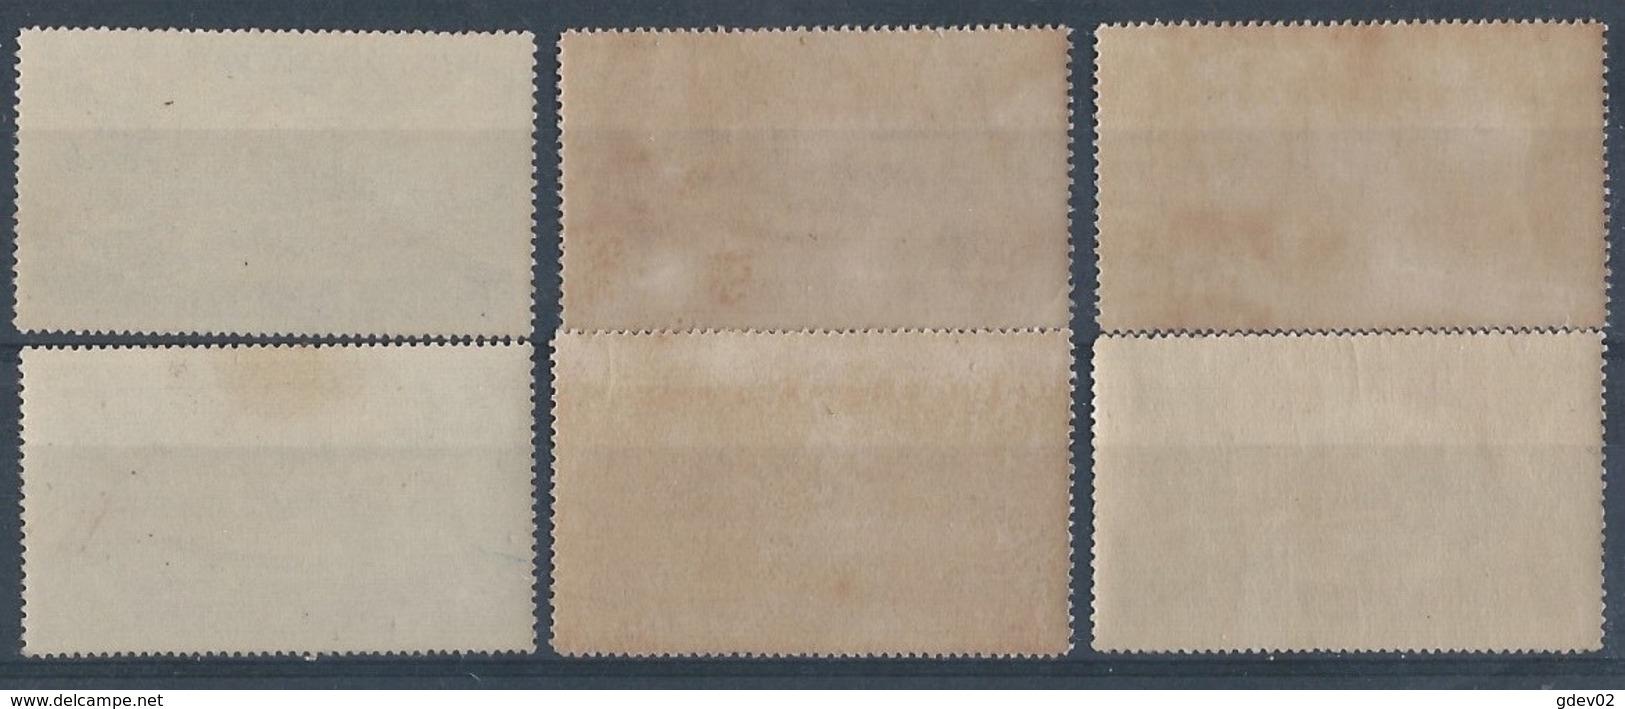 ES775-2936TT-MCES1.CORREO SUBMARINO 1938(Ed 775/0**)sin Charnela.MAgnifica - Submarinos